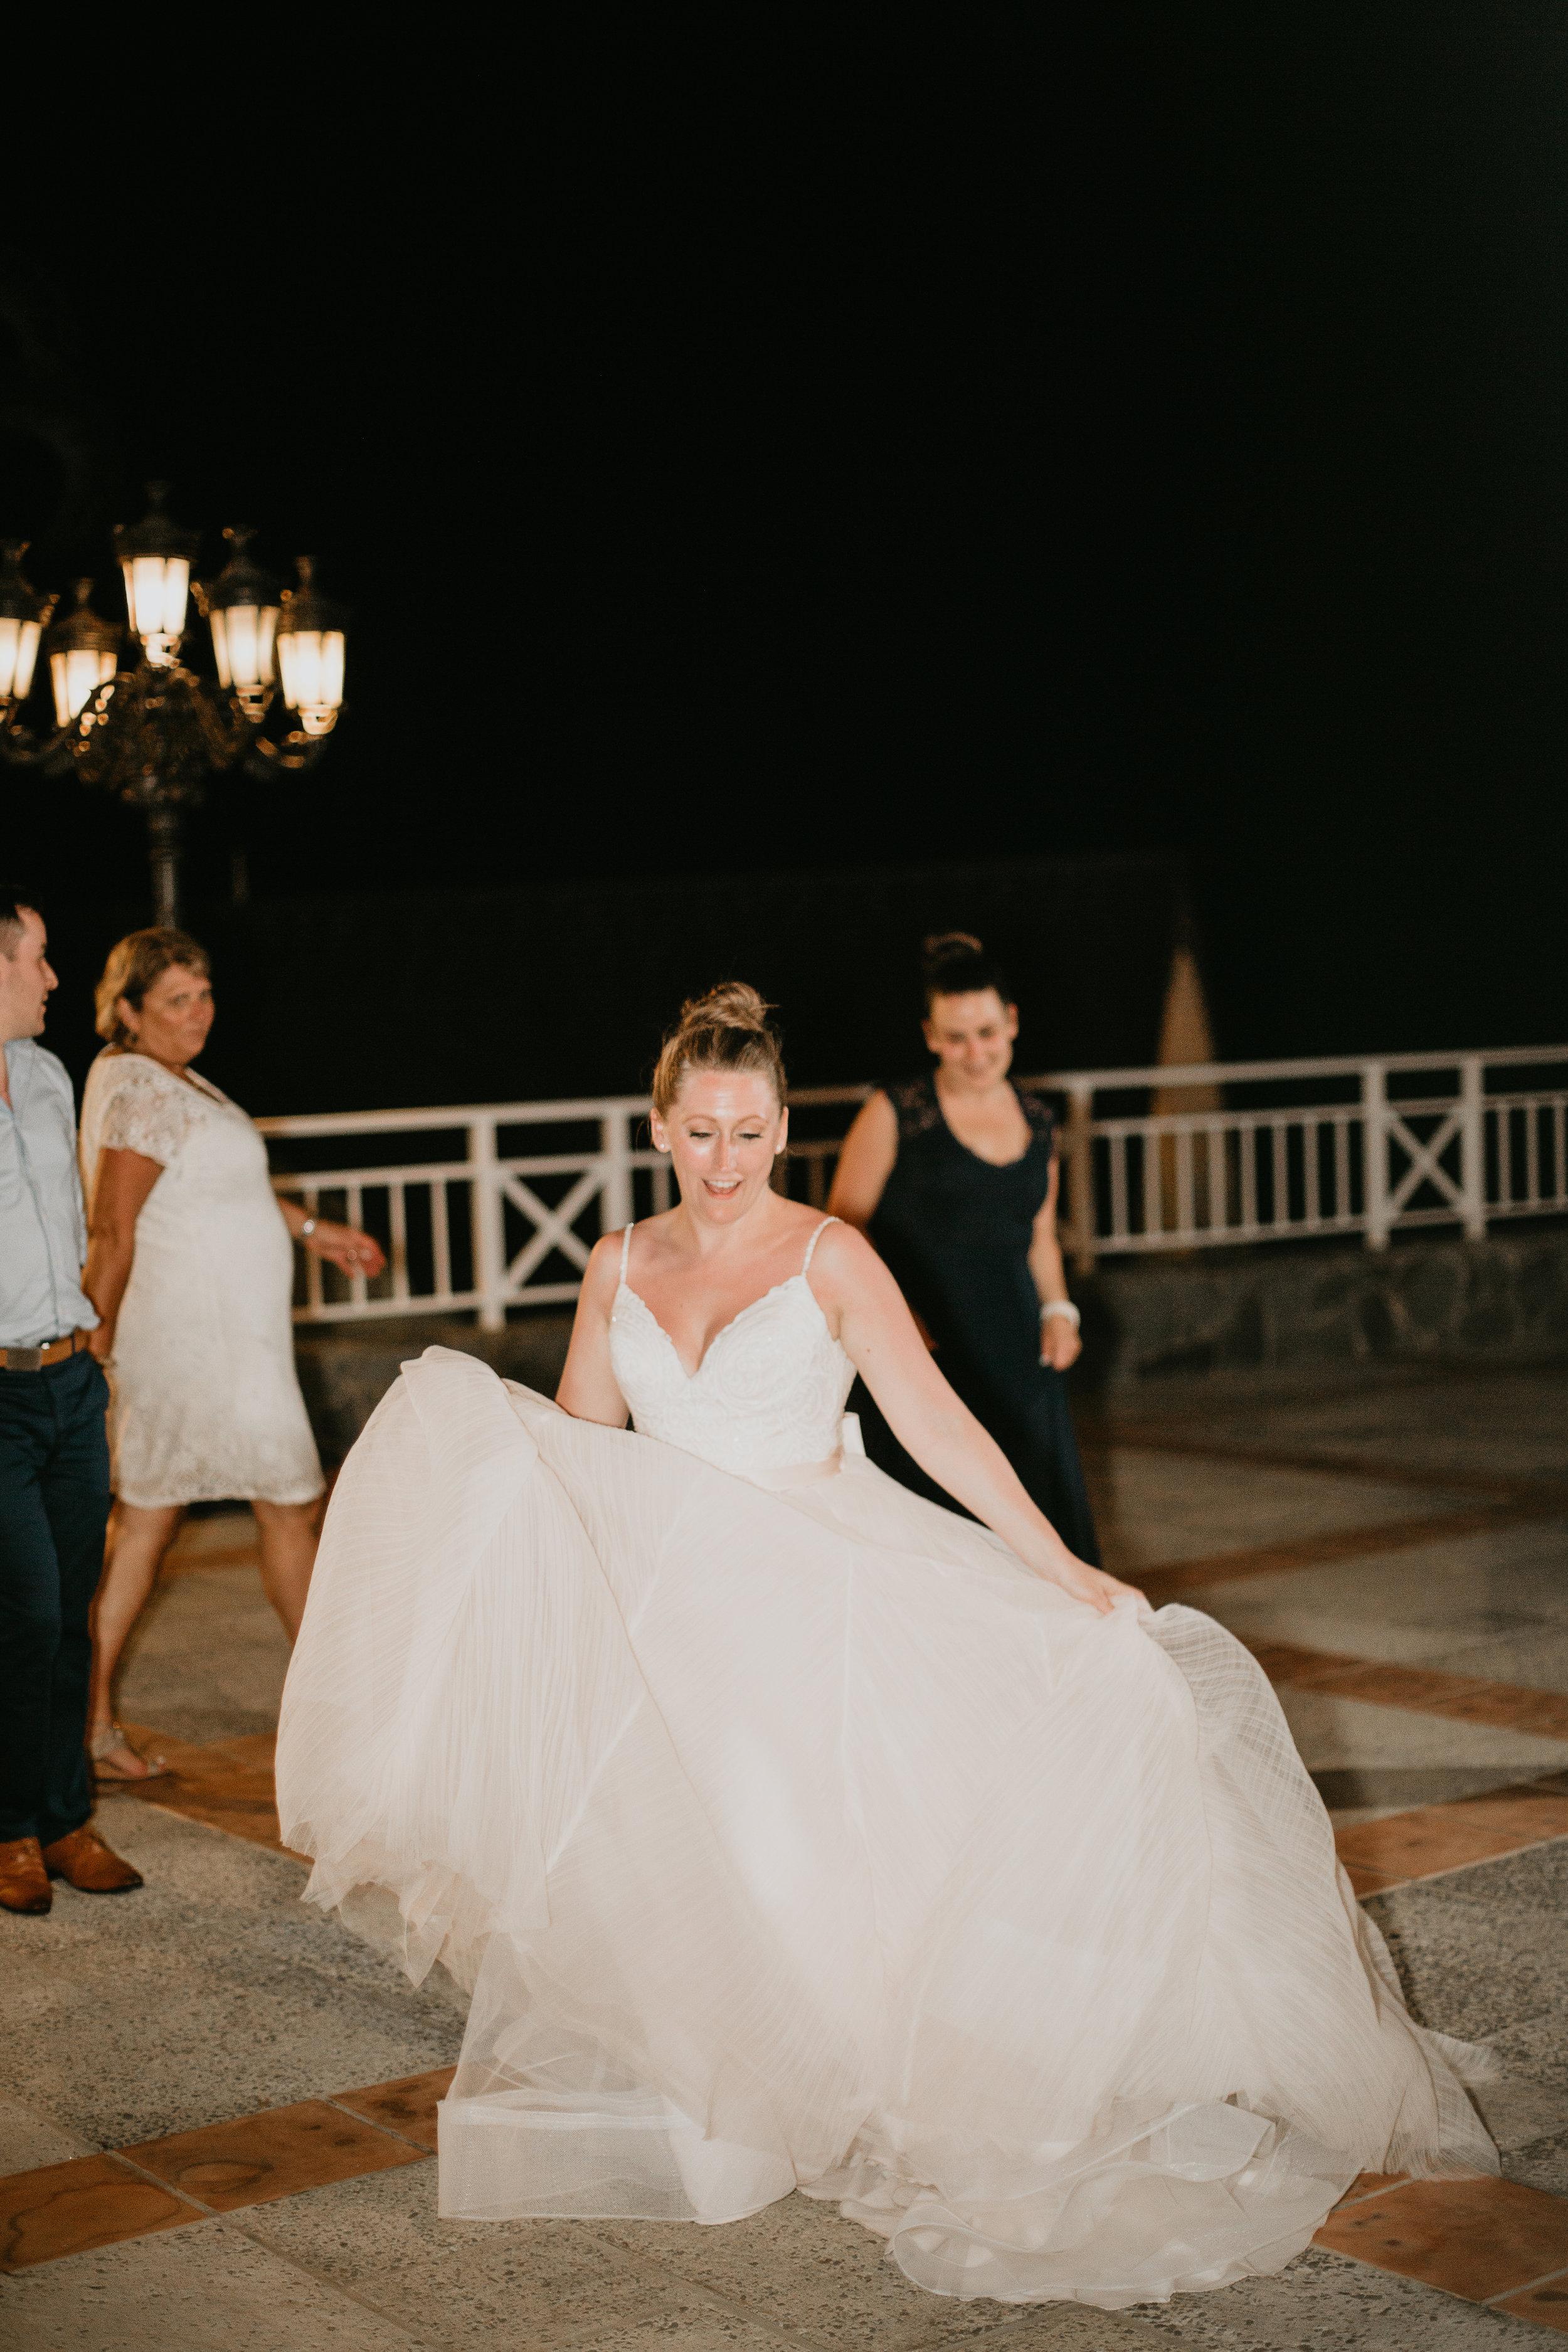 nicole-daacke-photography-destination-wedding-in-st-lucia-sandals-la-toc-intimate-island-wedding-carribean-elopement-photographer-chill-island-wedding-171.jpg